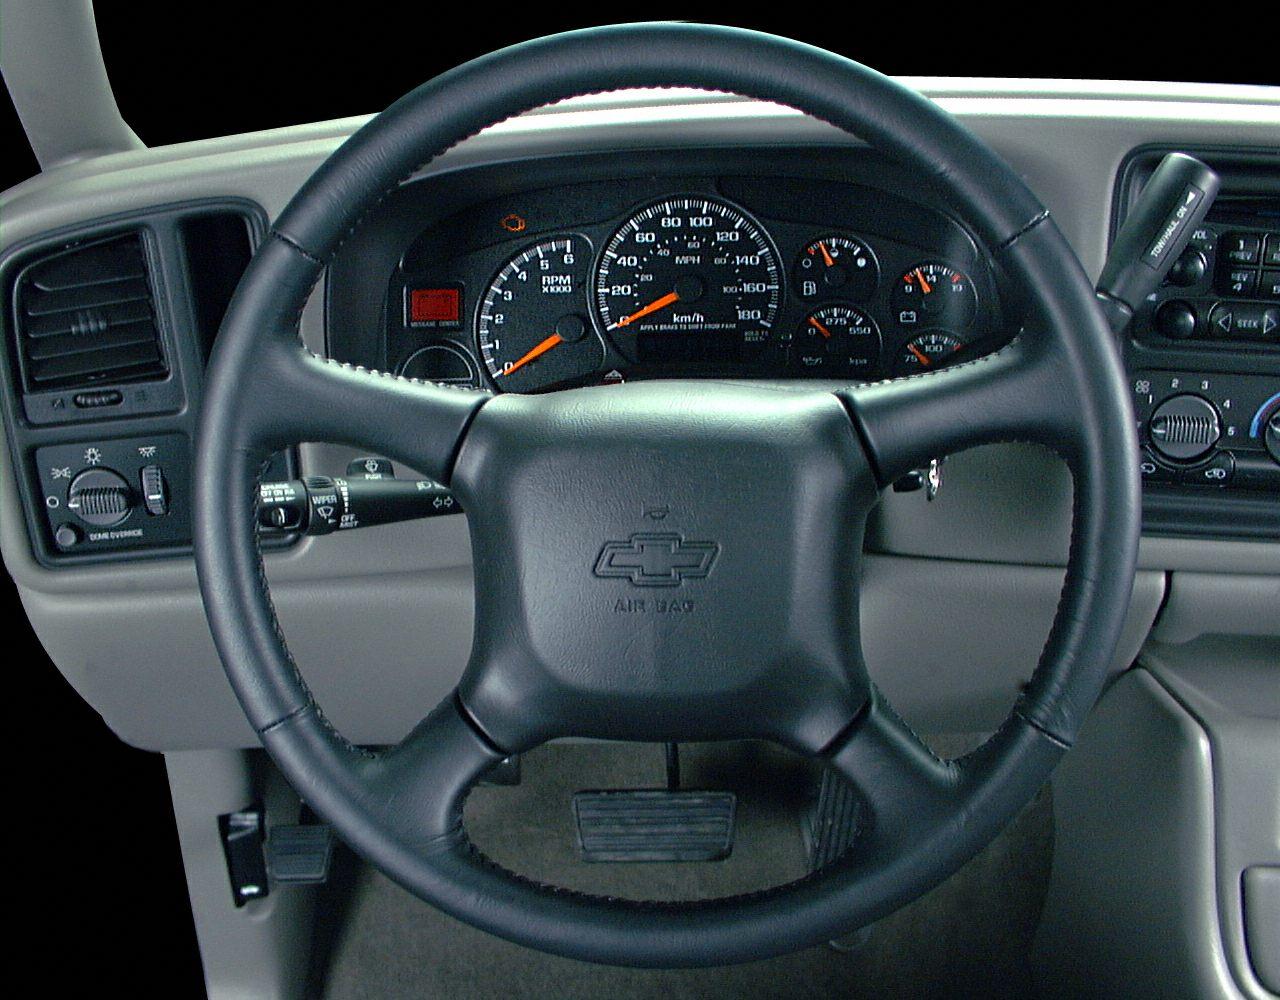 2000 chevrolet silverado 1500 lt 3dr 4x2 extended cab 6 6 - 2000 chevy silverado 1500 interior ...